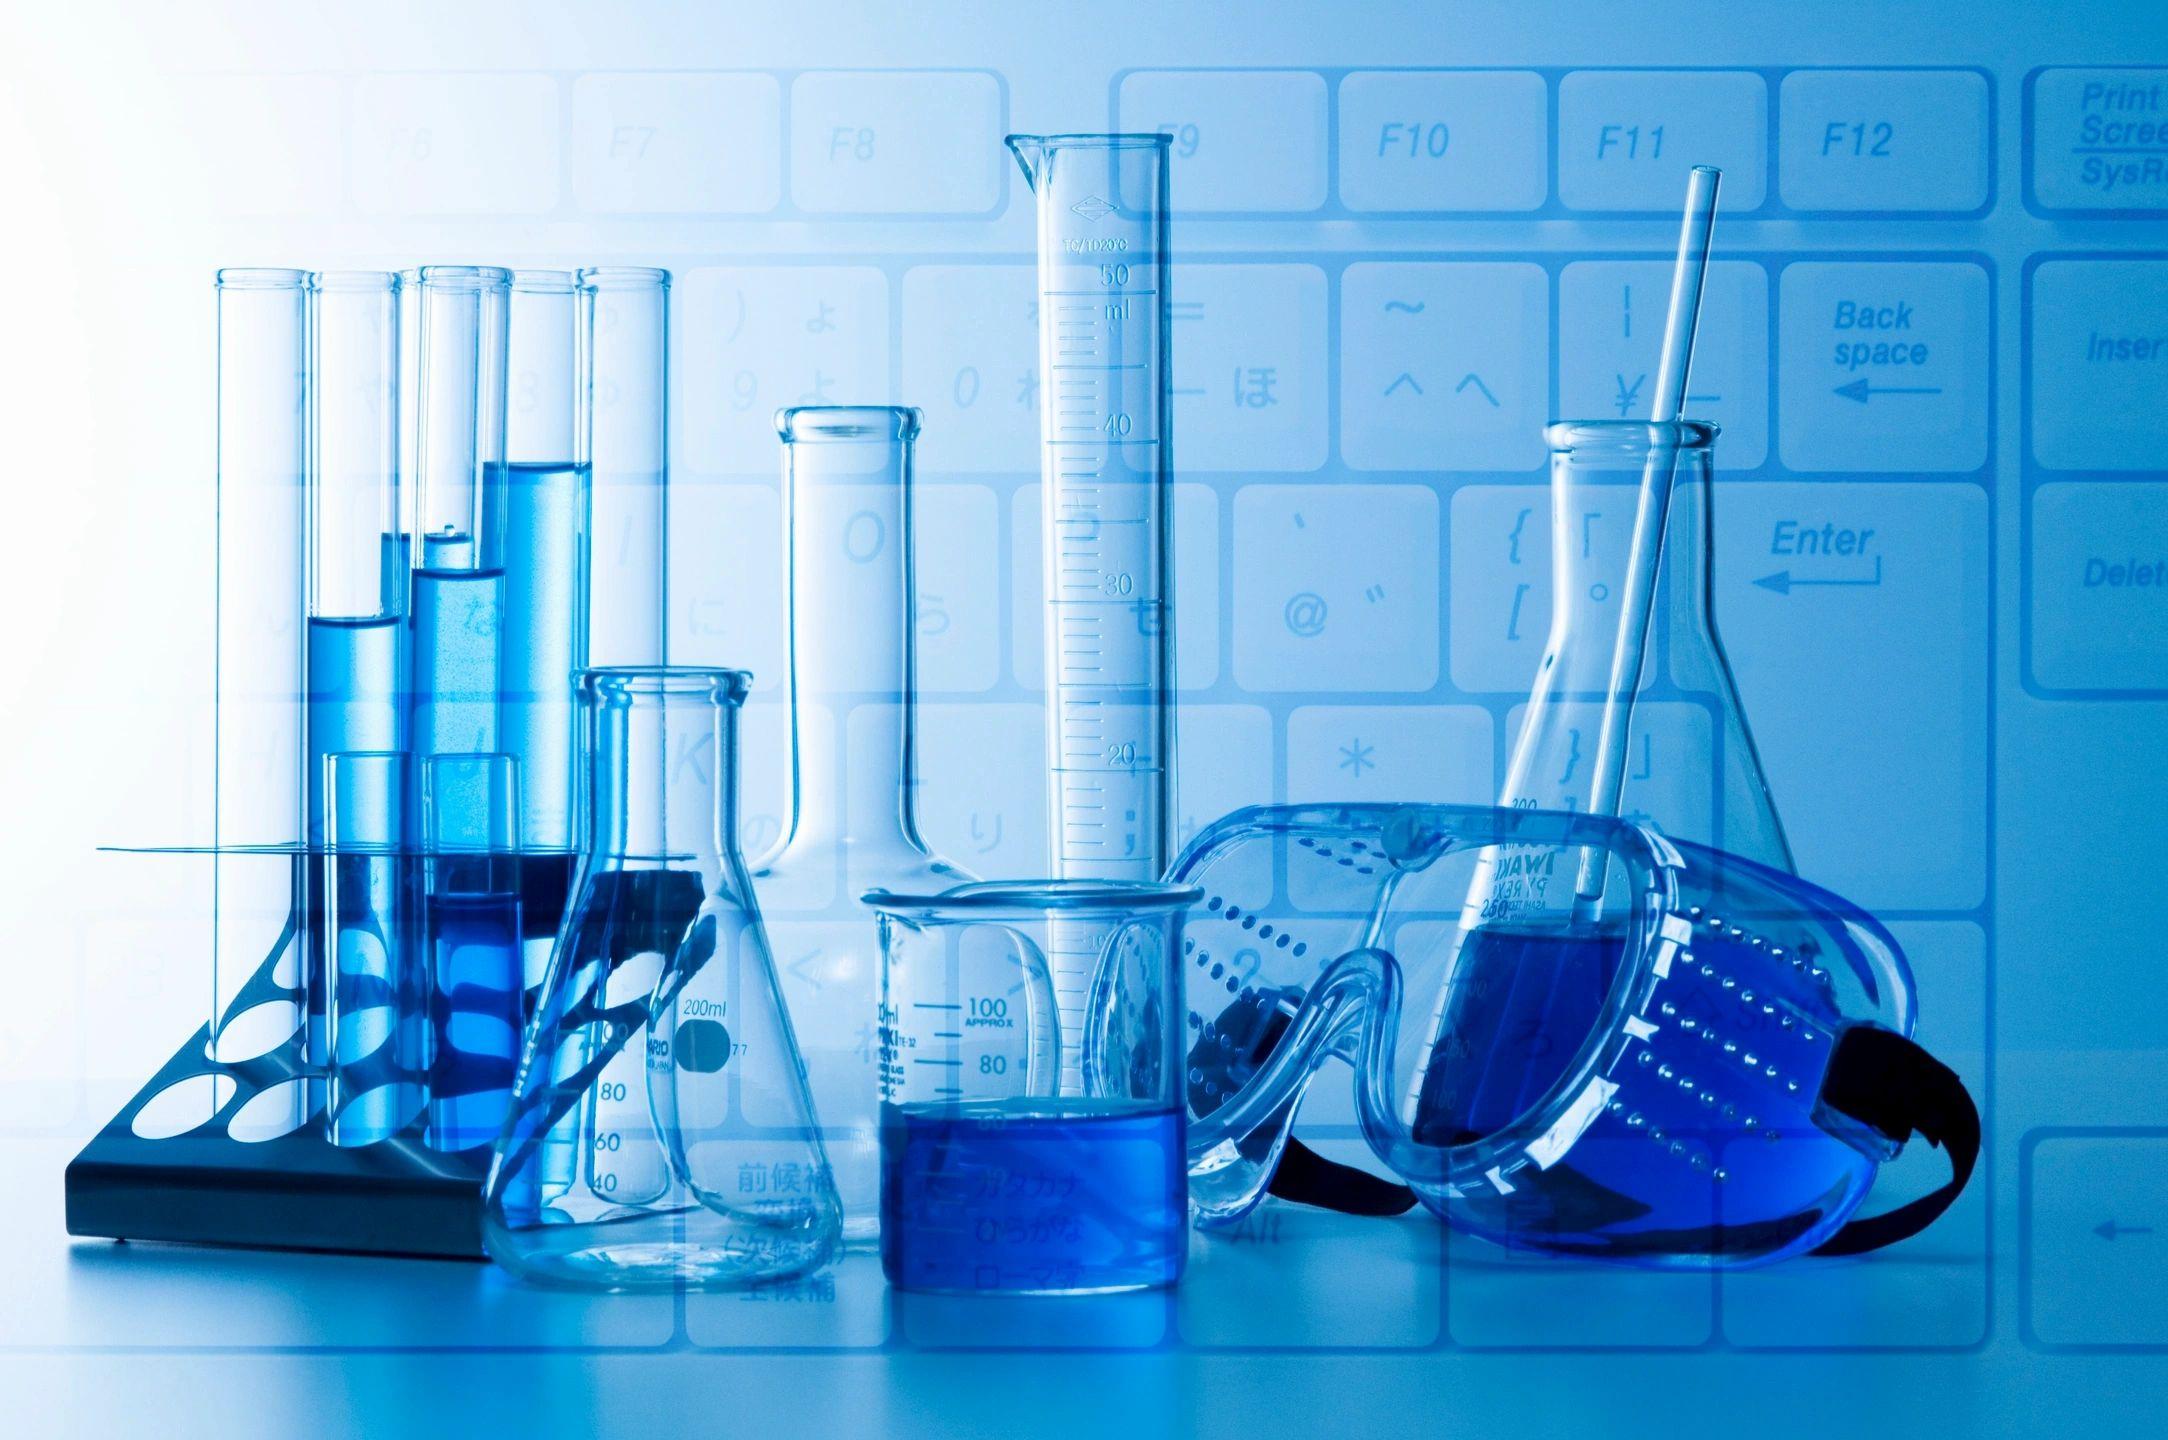 Analytical Testing Laboratory Co Inc